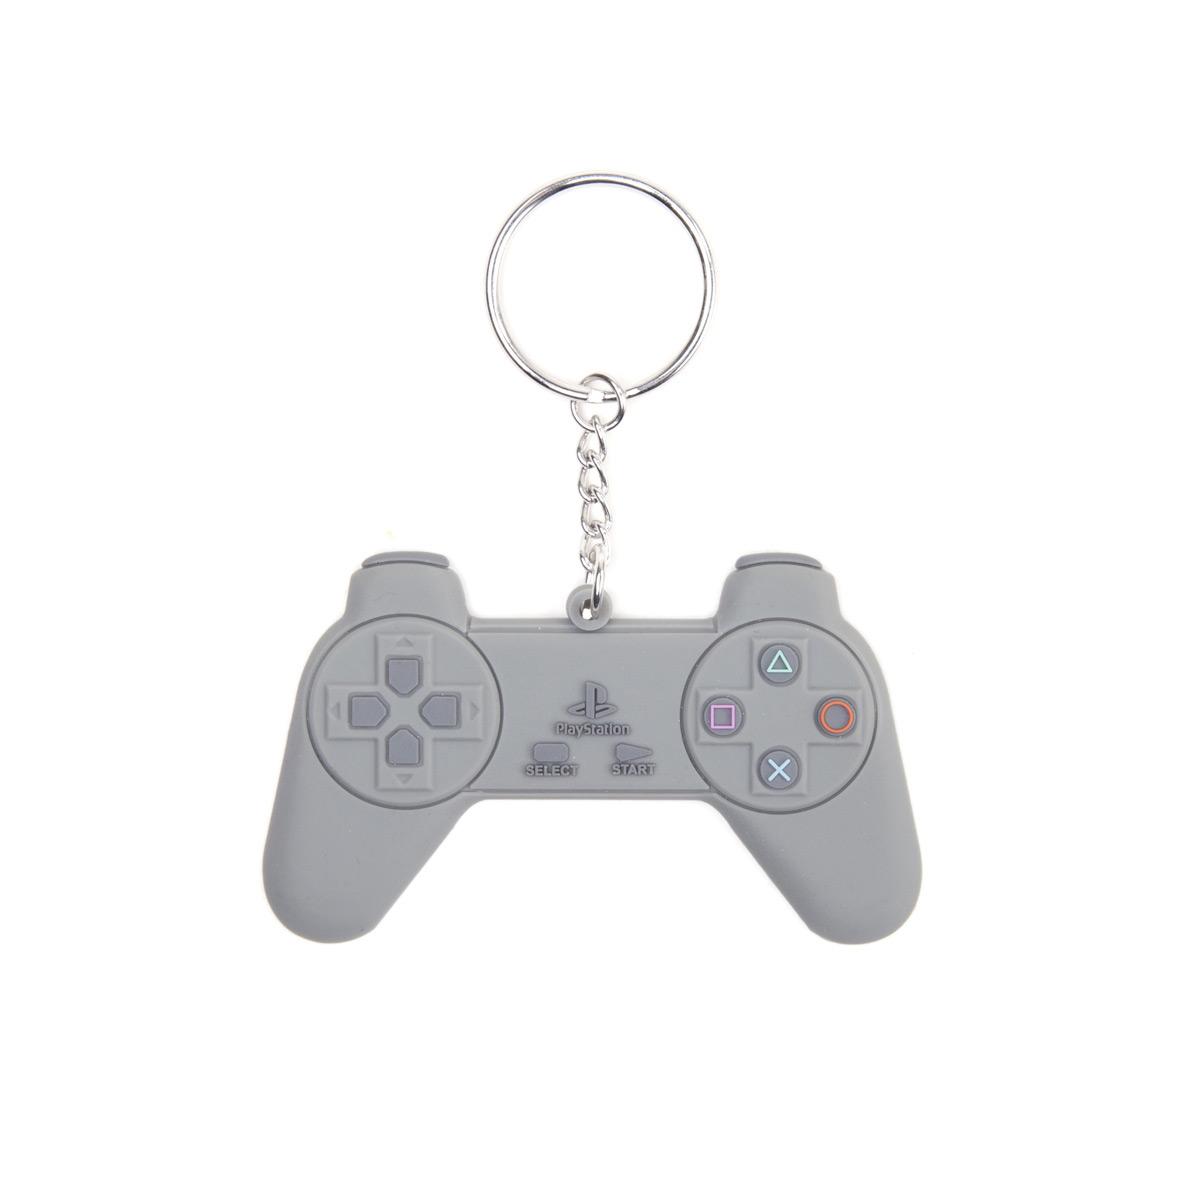 Brelok Playstation - Grey Controller Rubber Keychain